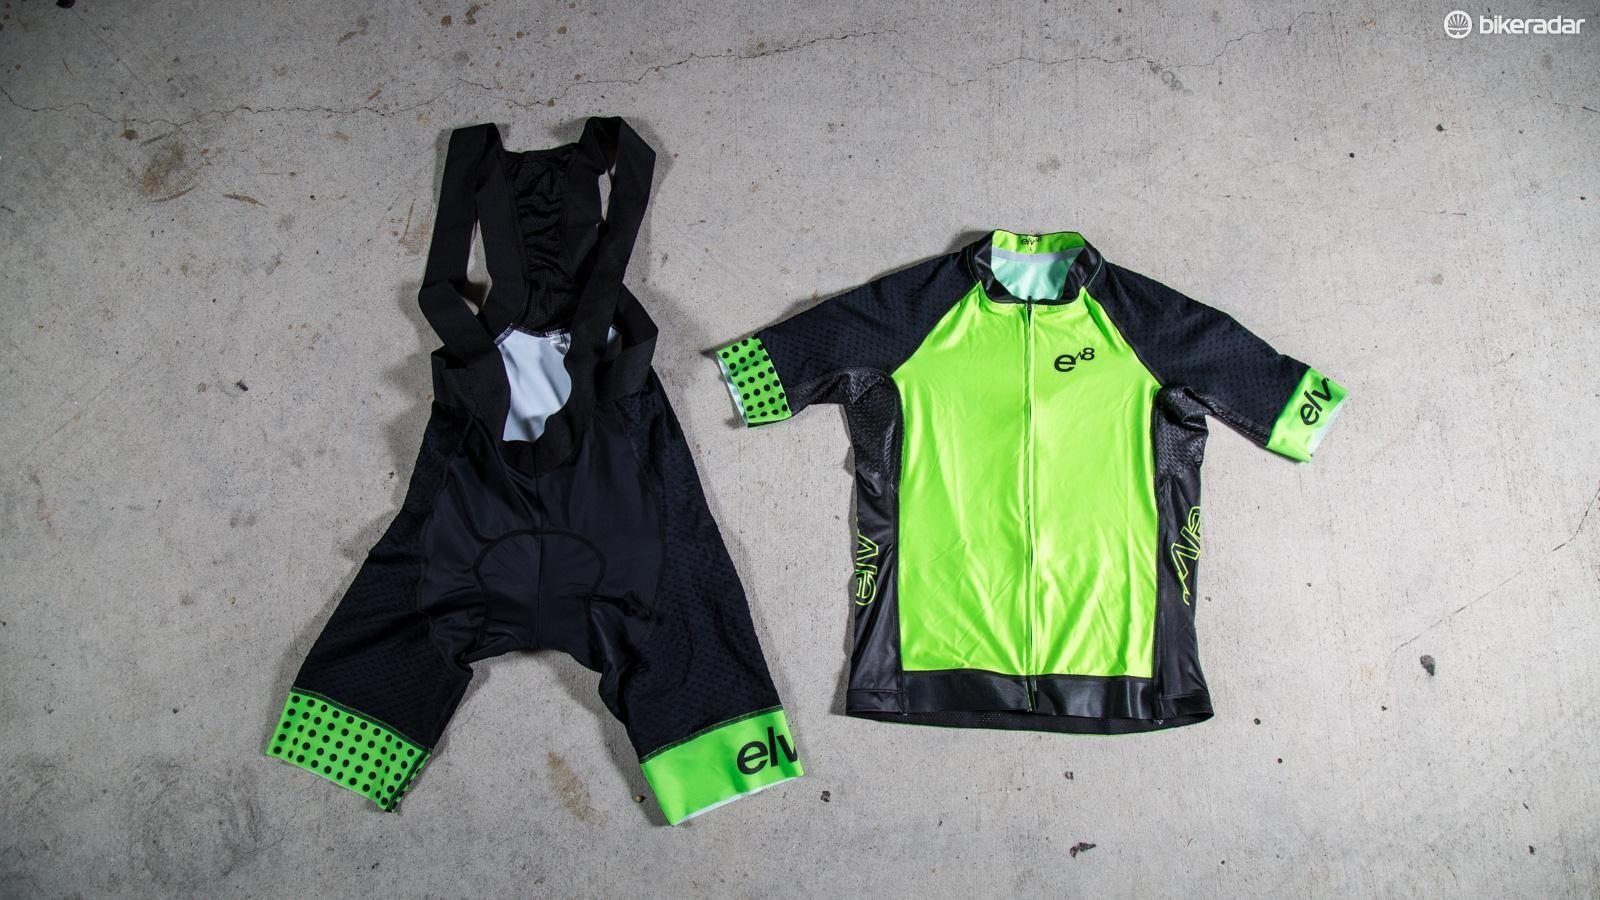 Elv^8 is a new Aussie brand producing aero-optimised kits